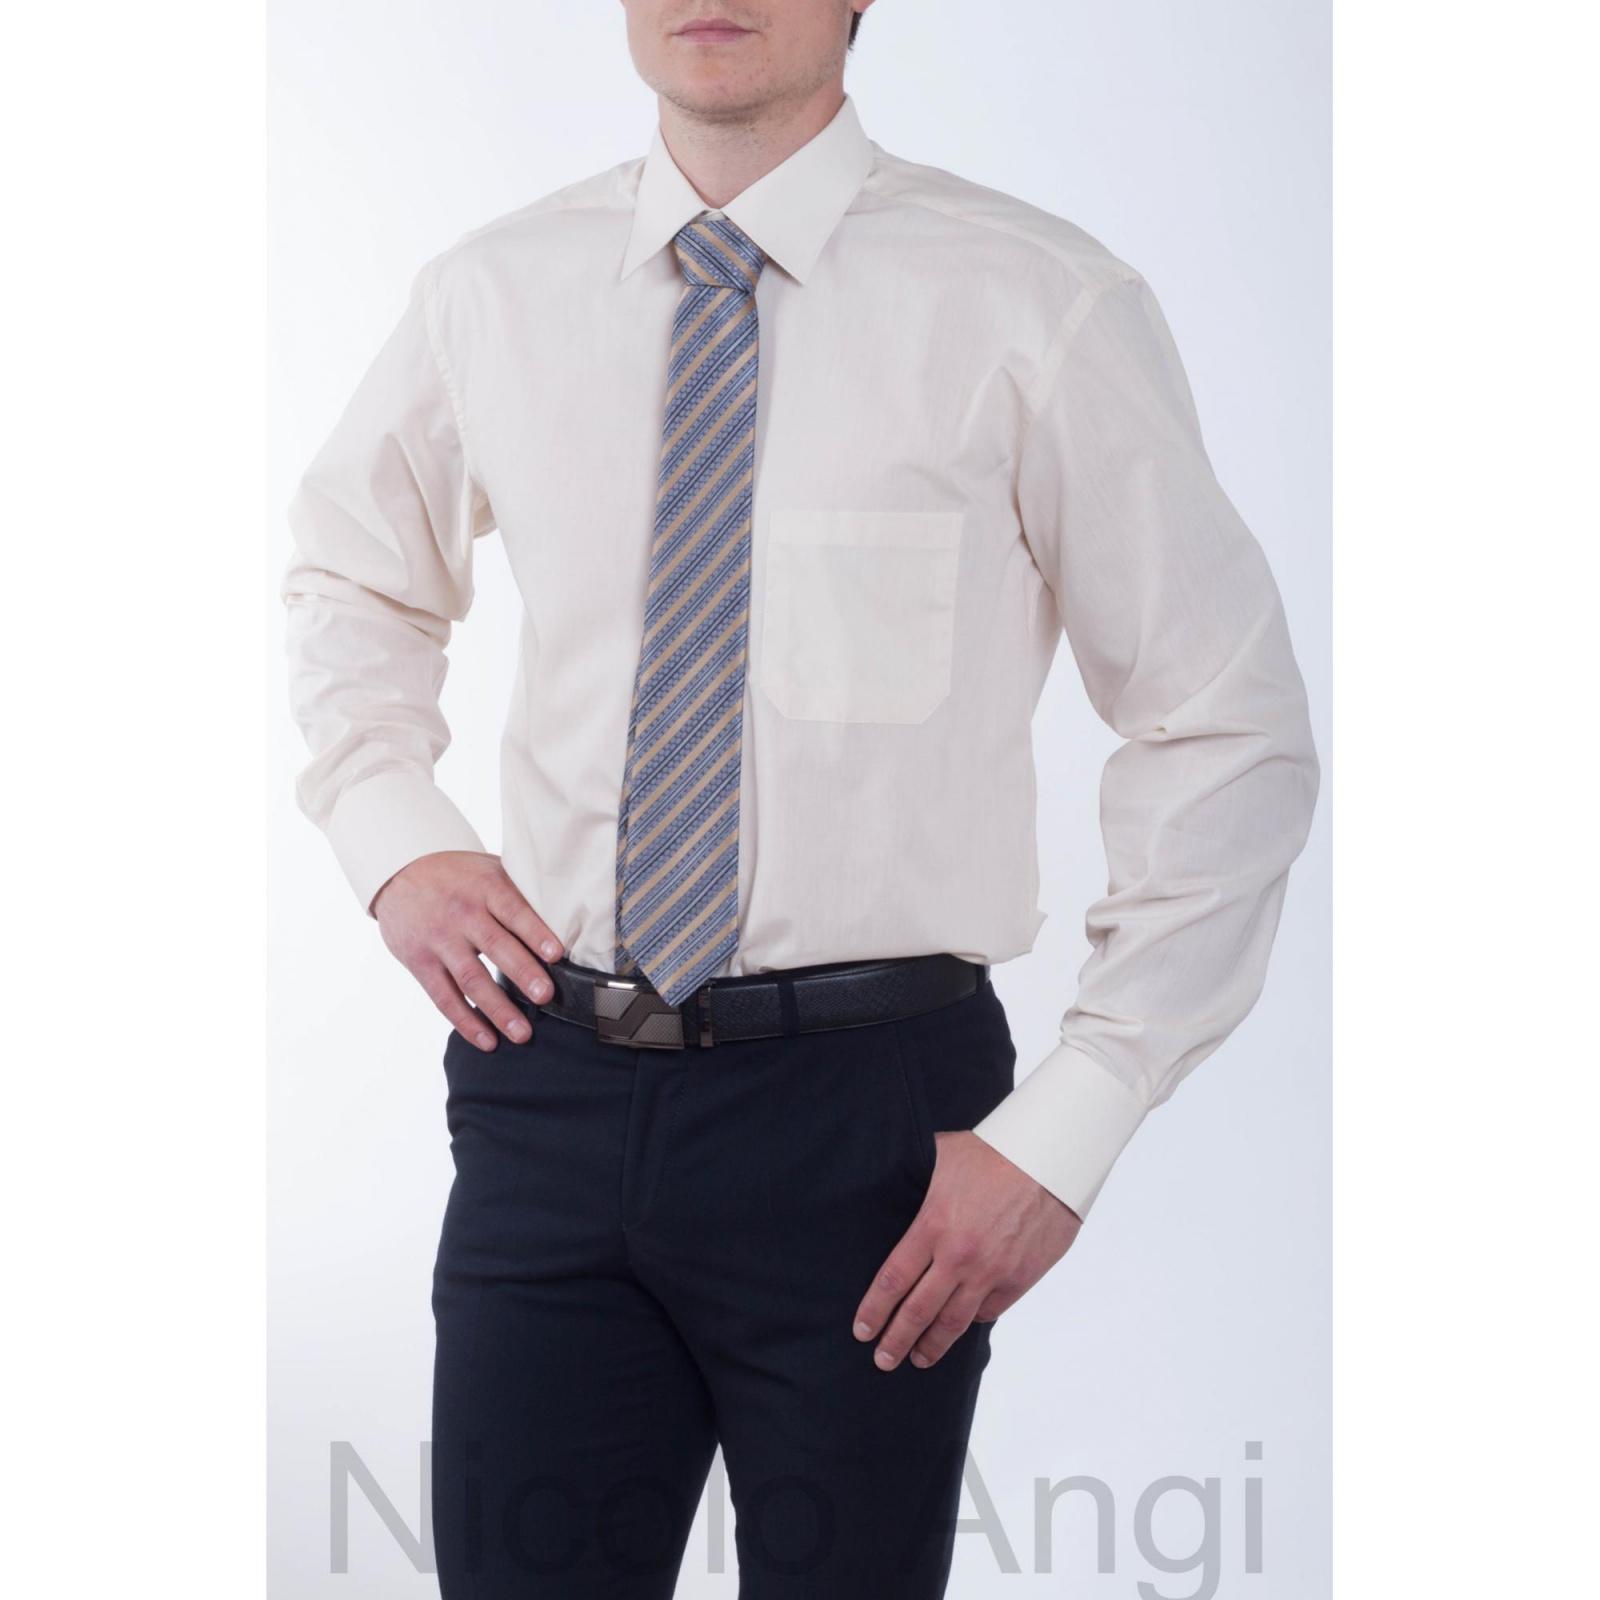 Рубашка мужская iv60702 бюстье serge 1006 7 рост 170